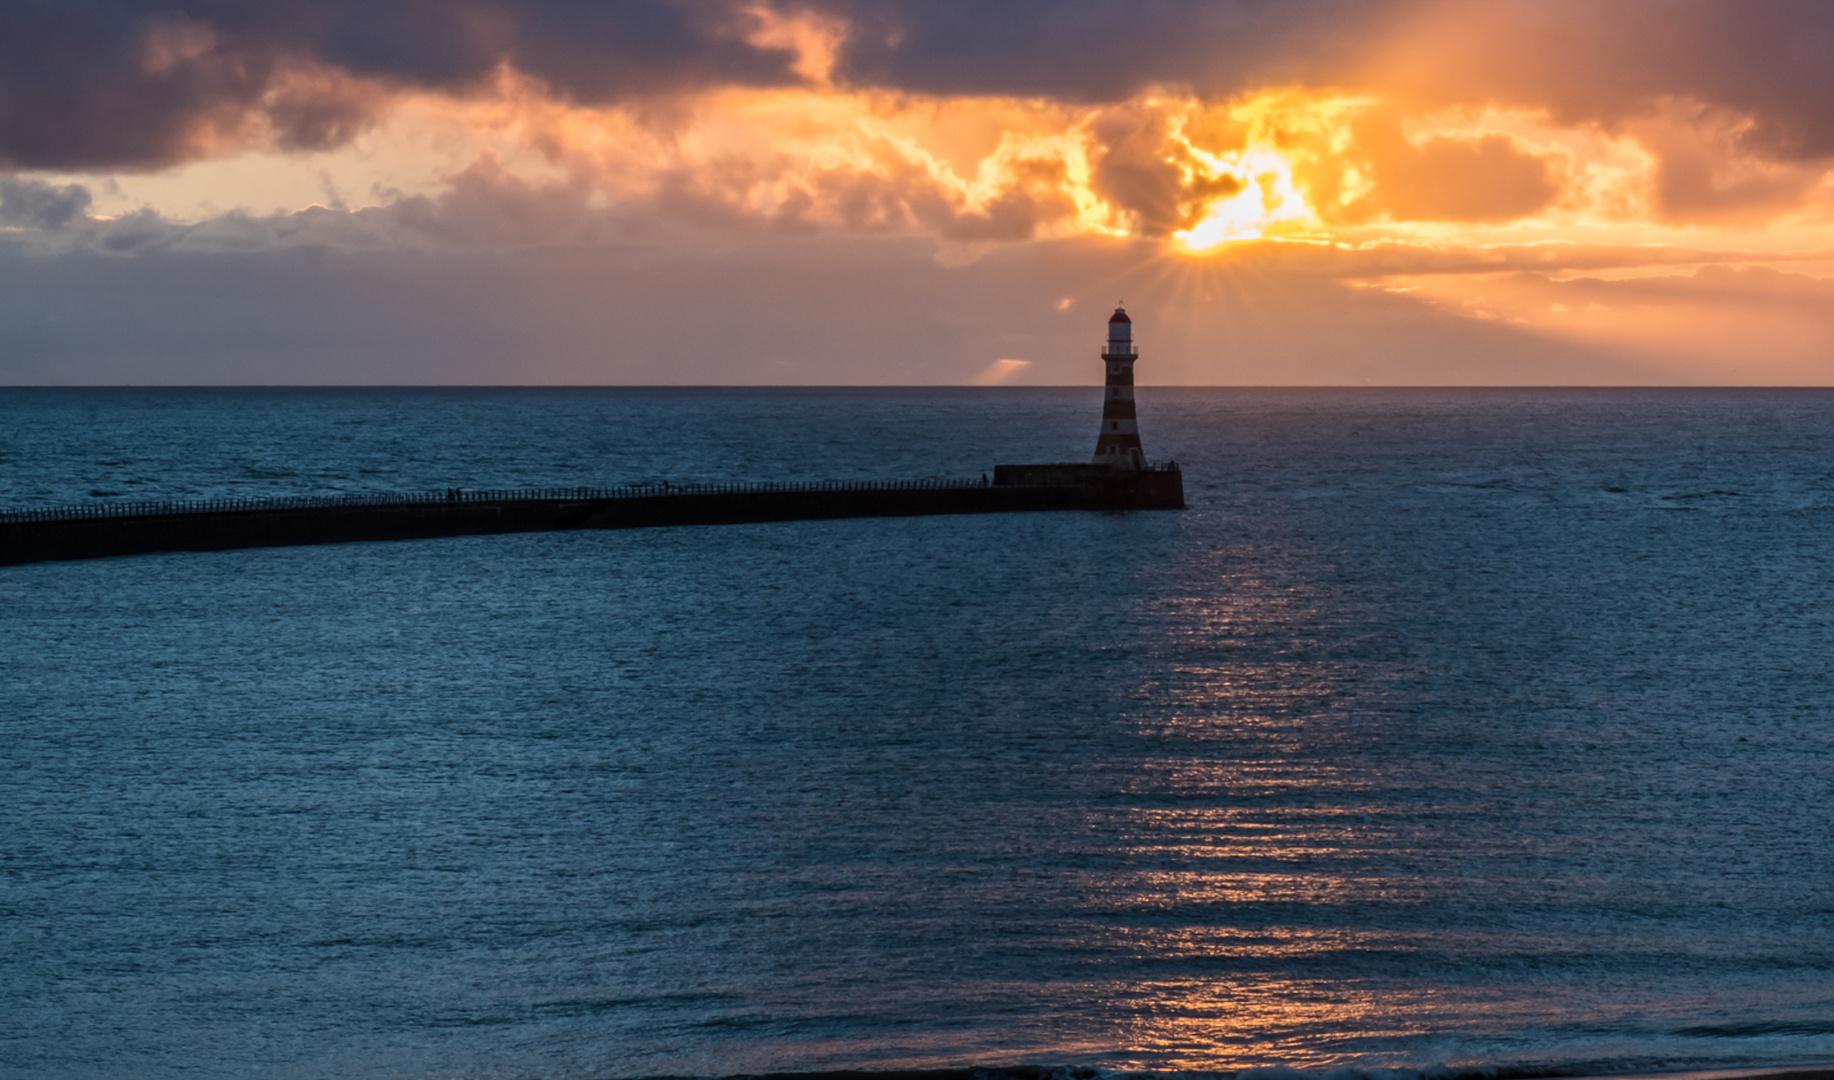 Rocker lighthouse